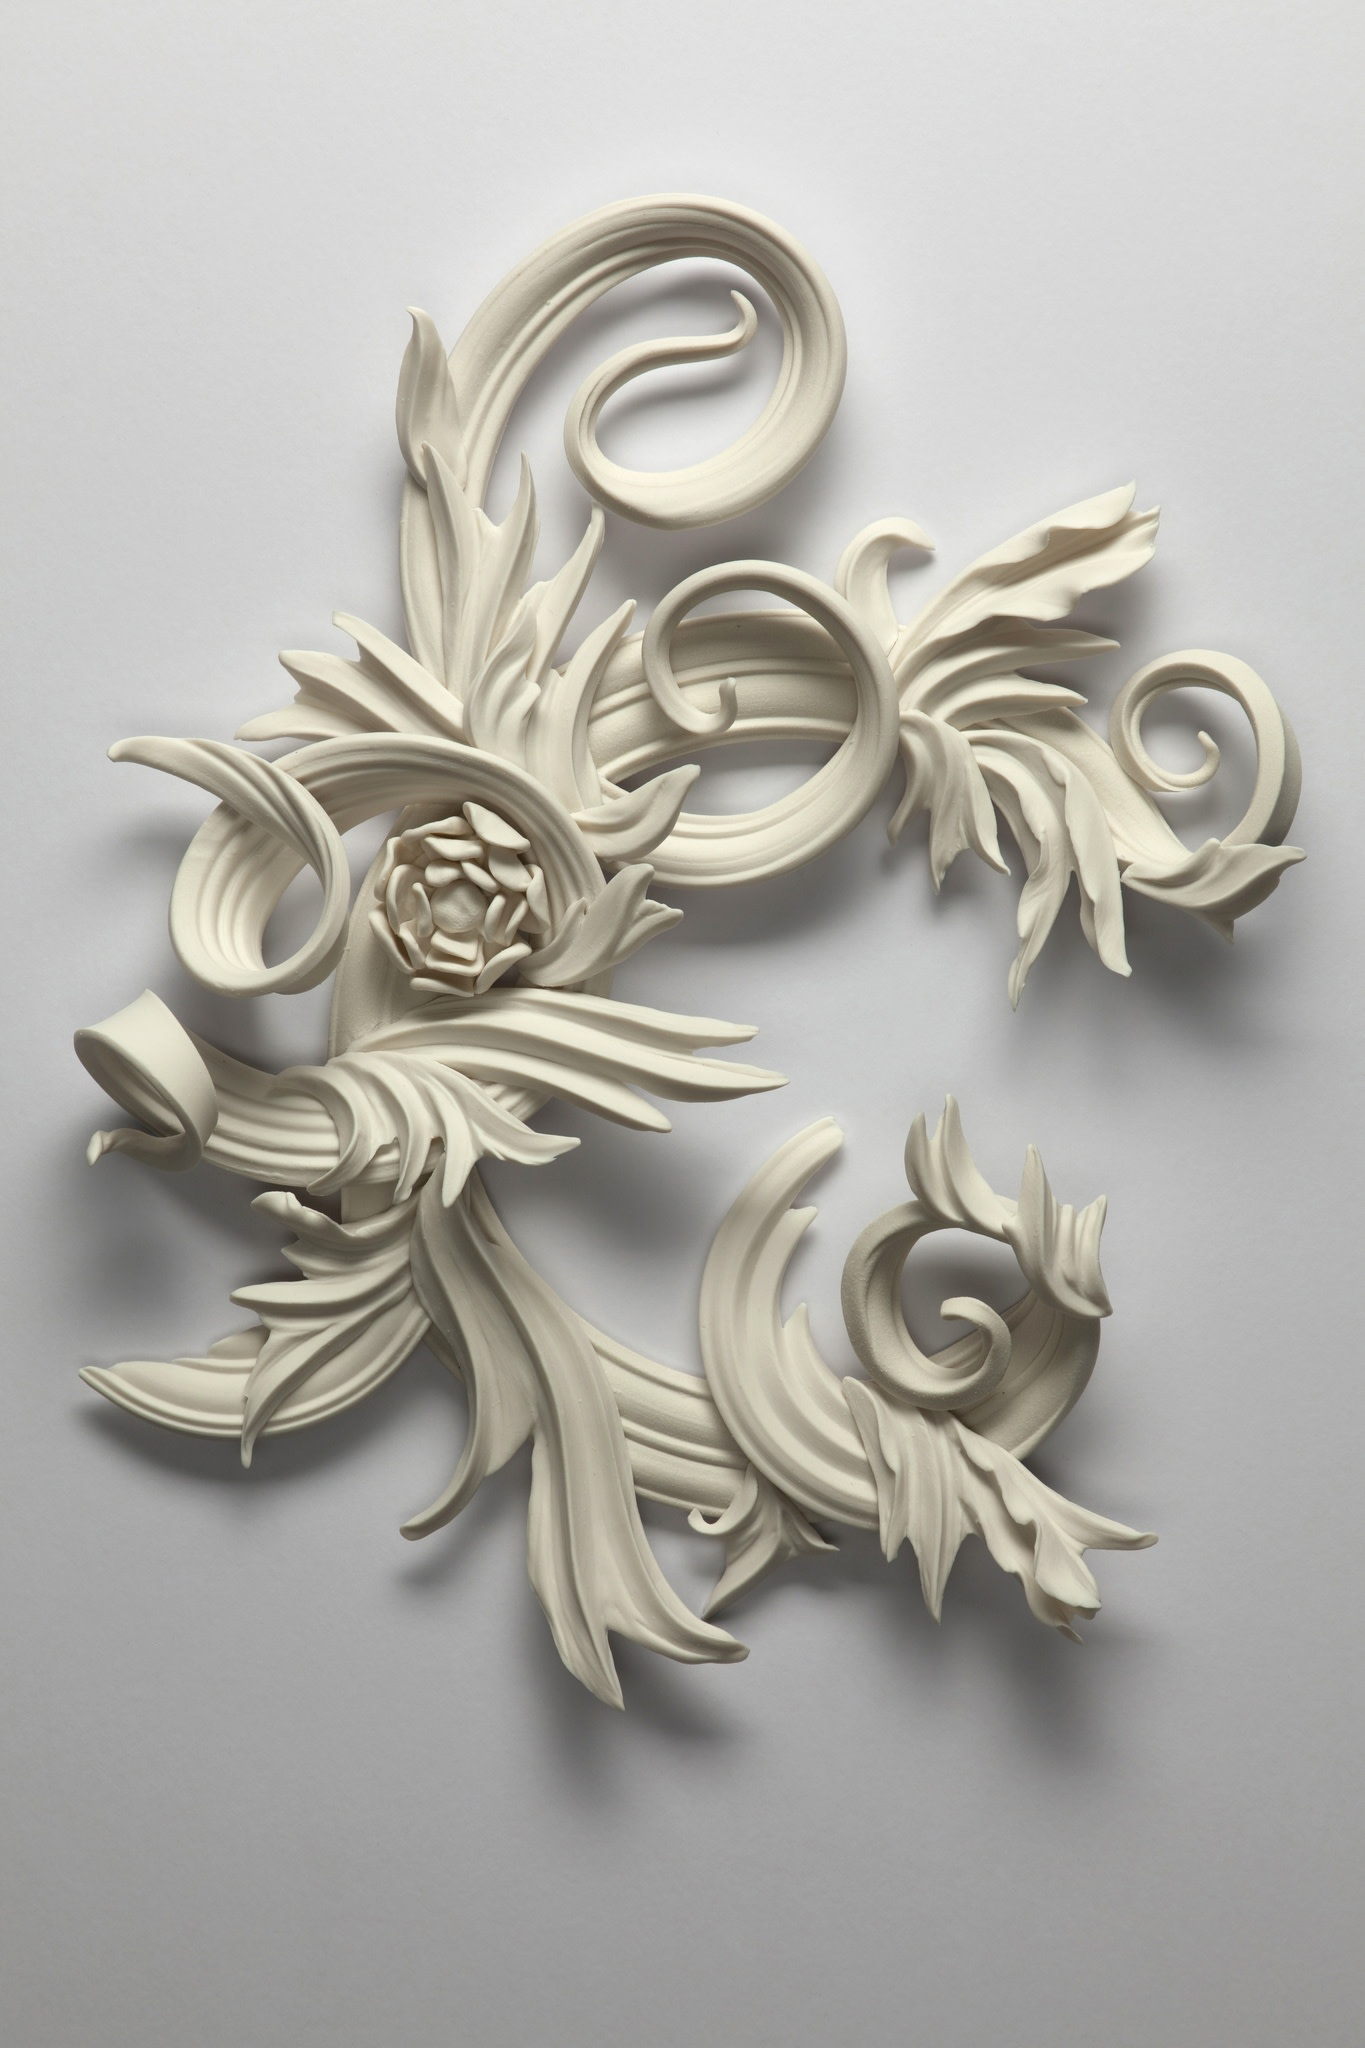 "<span class=""link fancybox-details-link""><a href=""/exhibitions/34/works/artworks1148/"">View Detail Page</a></span><div class=""artist""><strong>Jo Taylor</strong></div><div class=""title""><em>Liverpool Links IV</em>, 2016</div><div class=""medium"">Porcelain</div><div class=""dimensions"">41 x 32 x 5 cm<br>16 1/8 x 12 5/8 x 2 in.</div>"